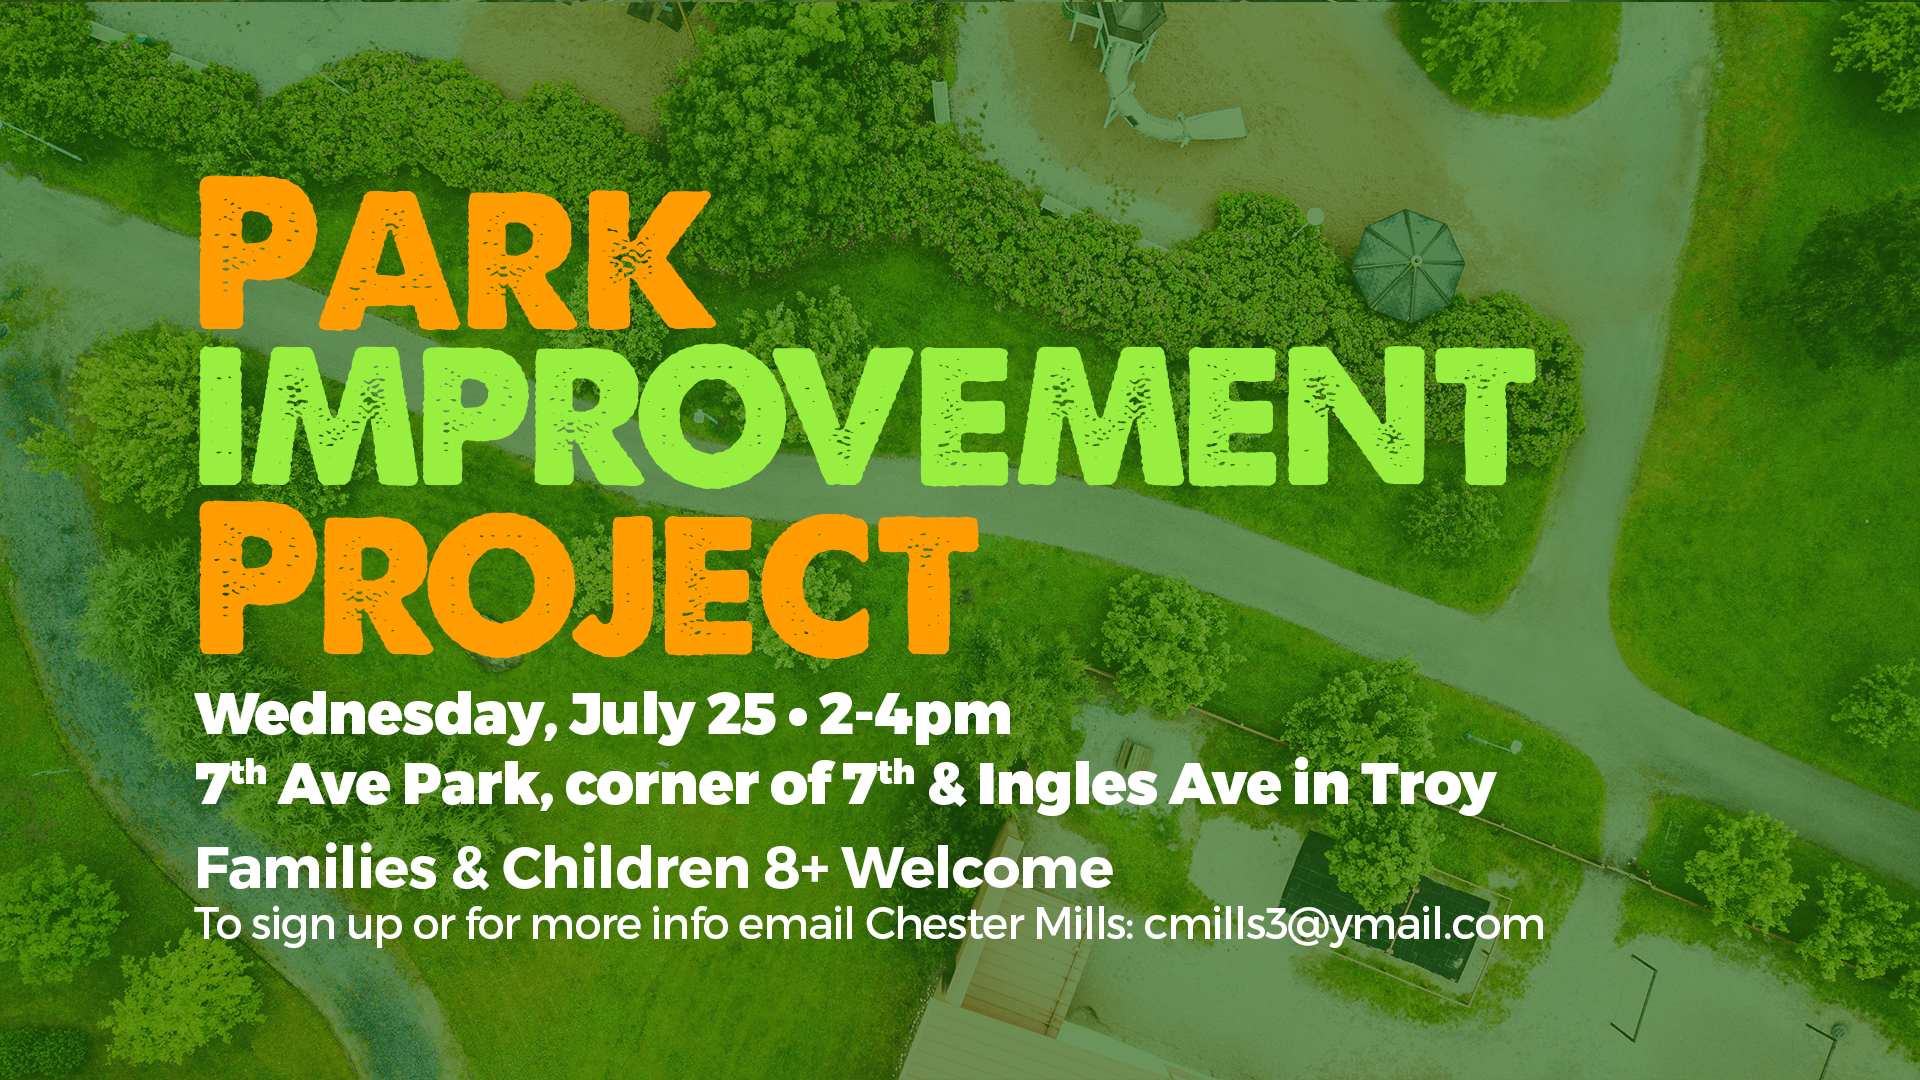 Neighborhood Park Improvement Project – family project